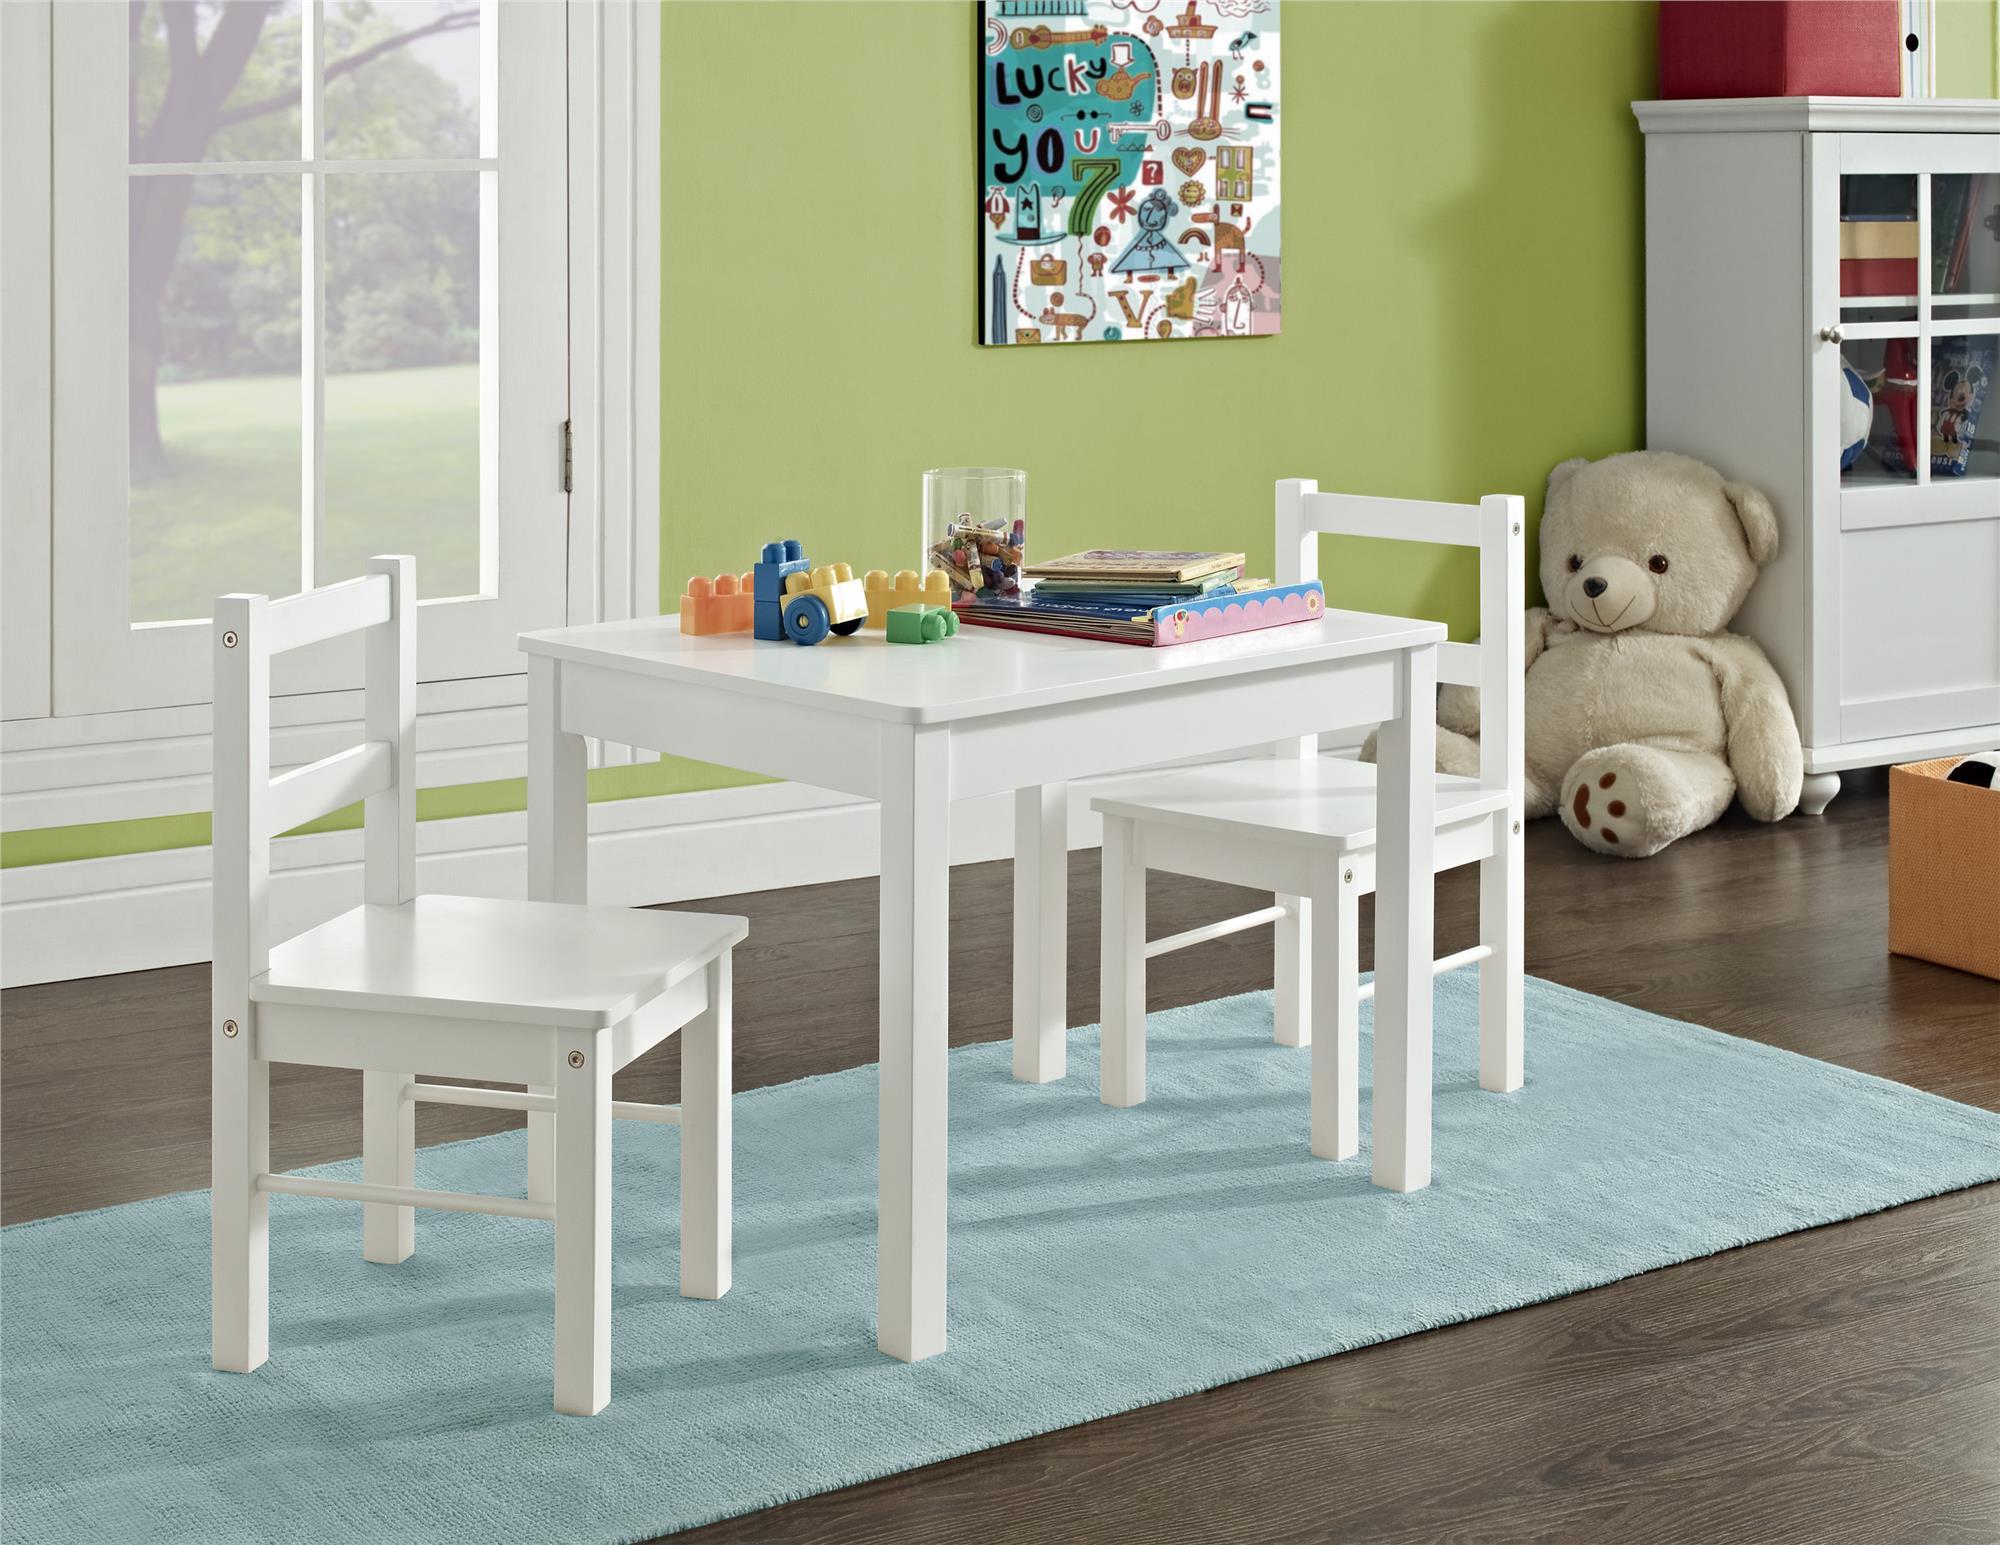 Dorel Home Furnishings Hazel Kids White Table and Chair Set- 3 piece ...